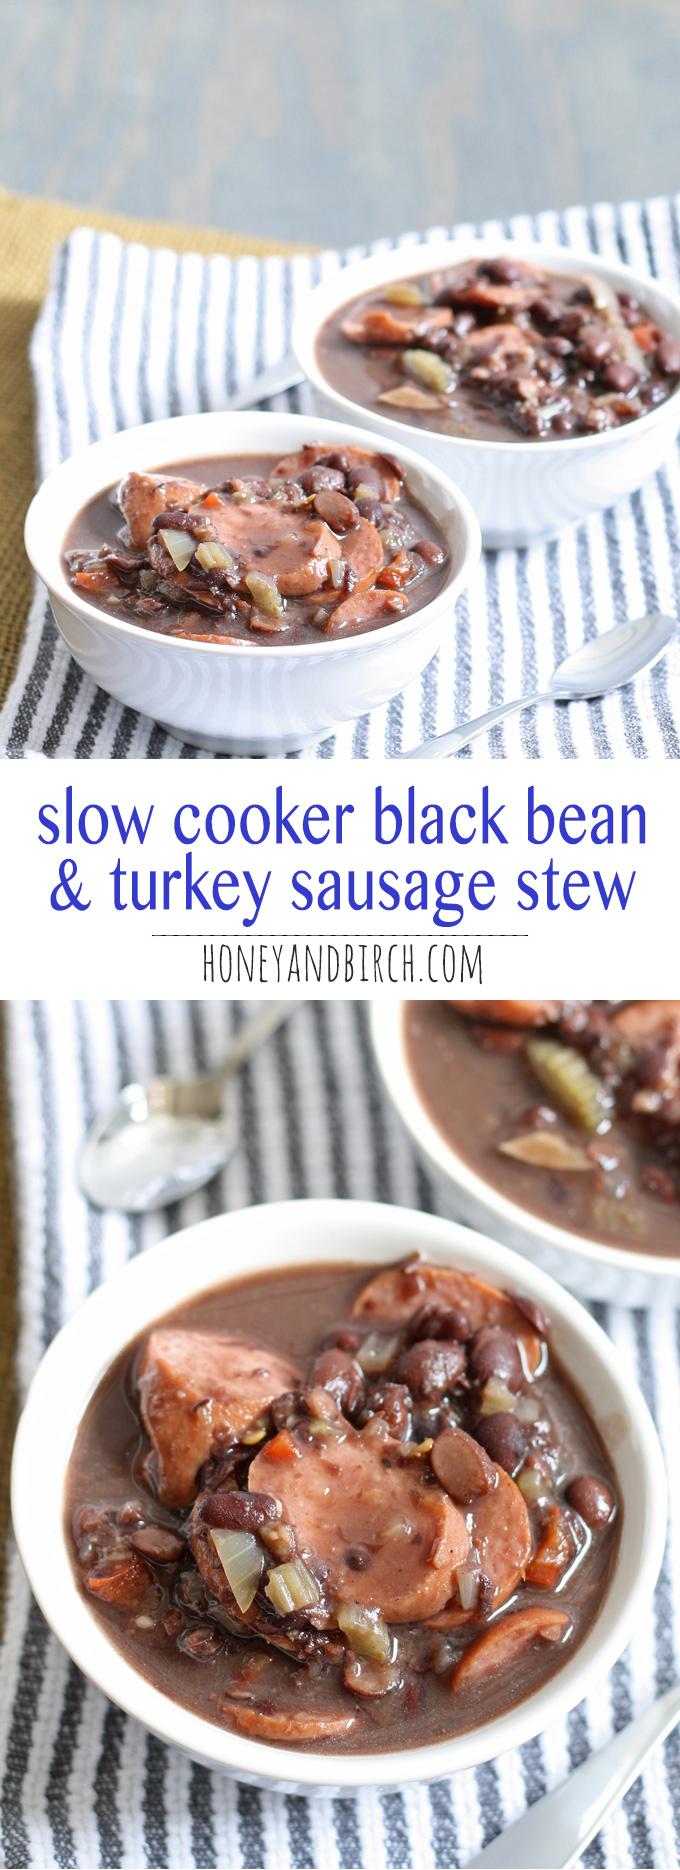 slow-cooker-black-bean-and-turkey-sausage-stew